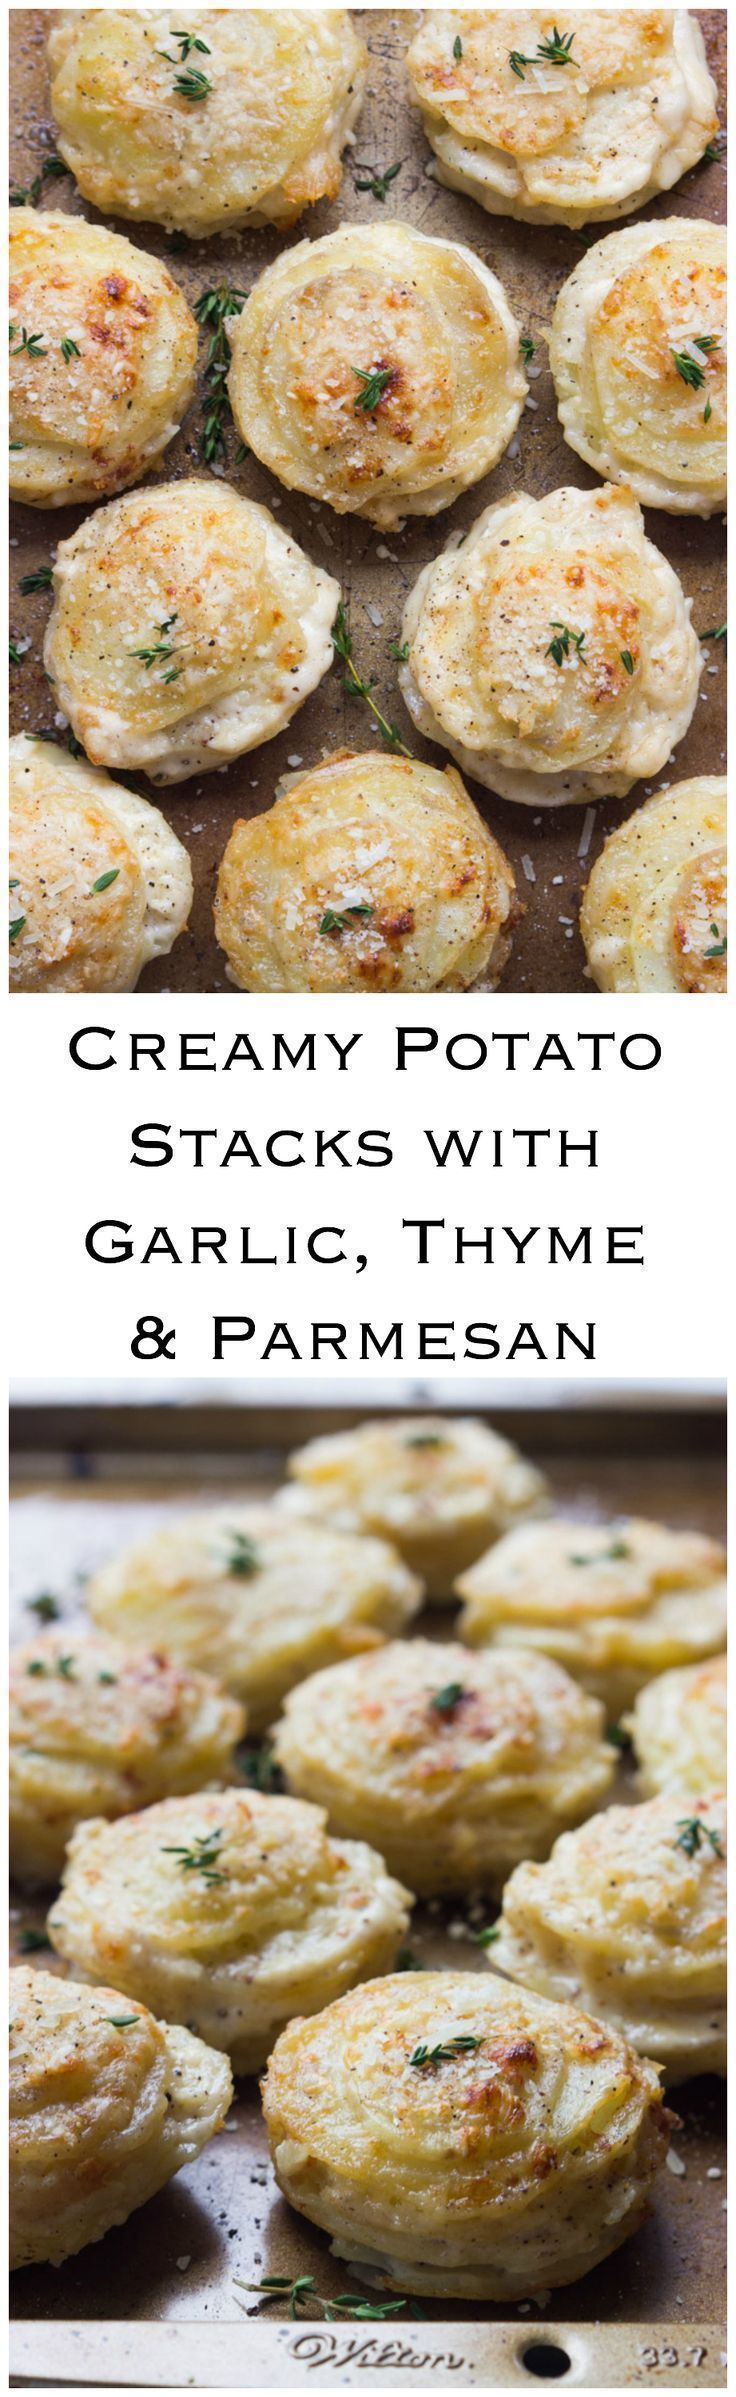 Creamy Potato Stacks with Garlic, Thyme, and Parmesan